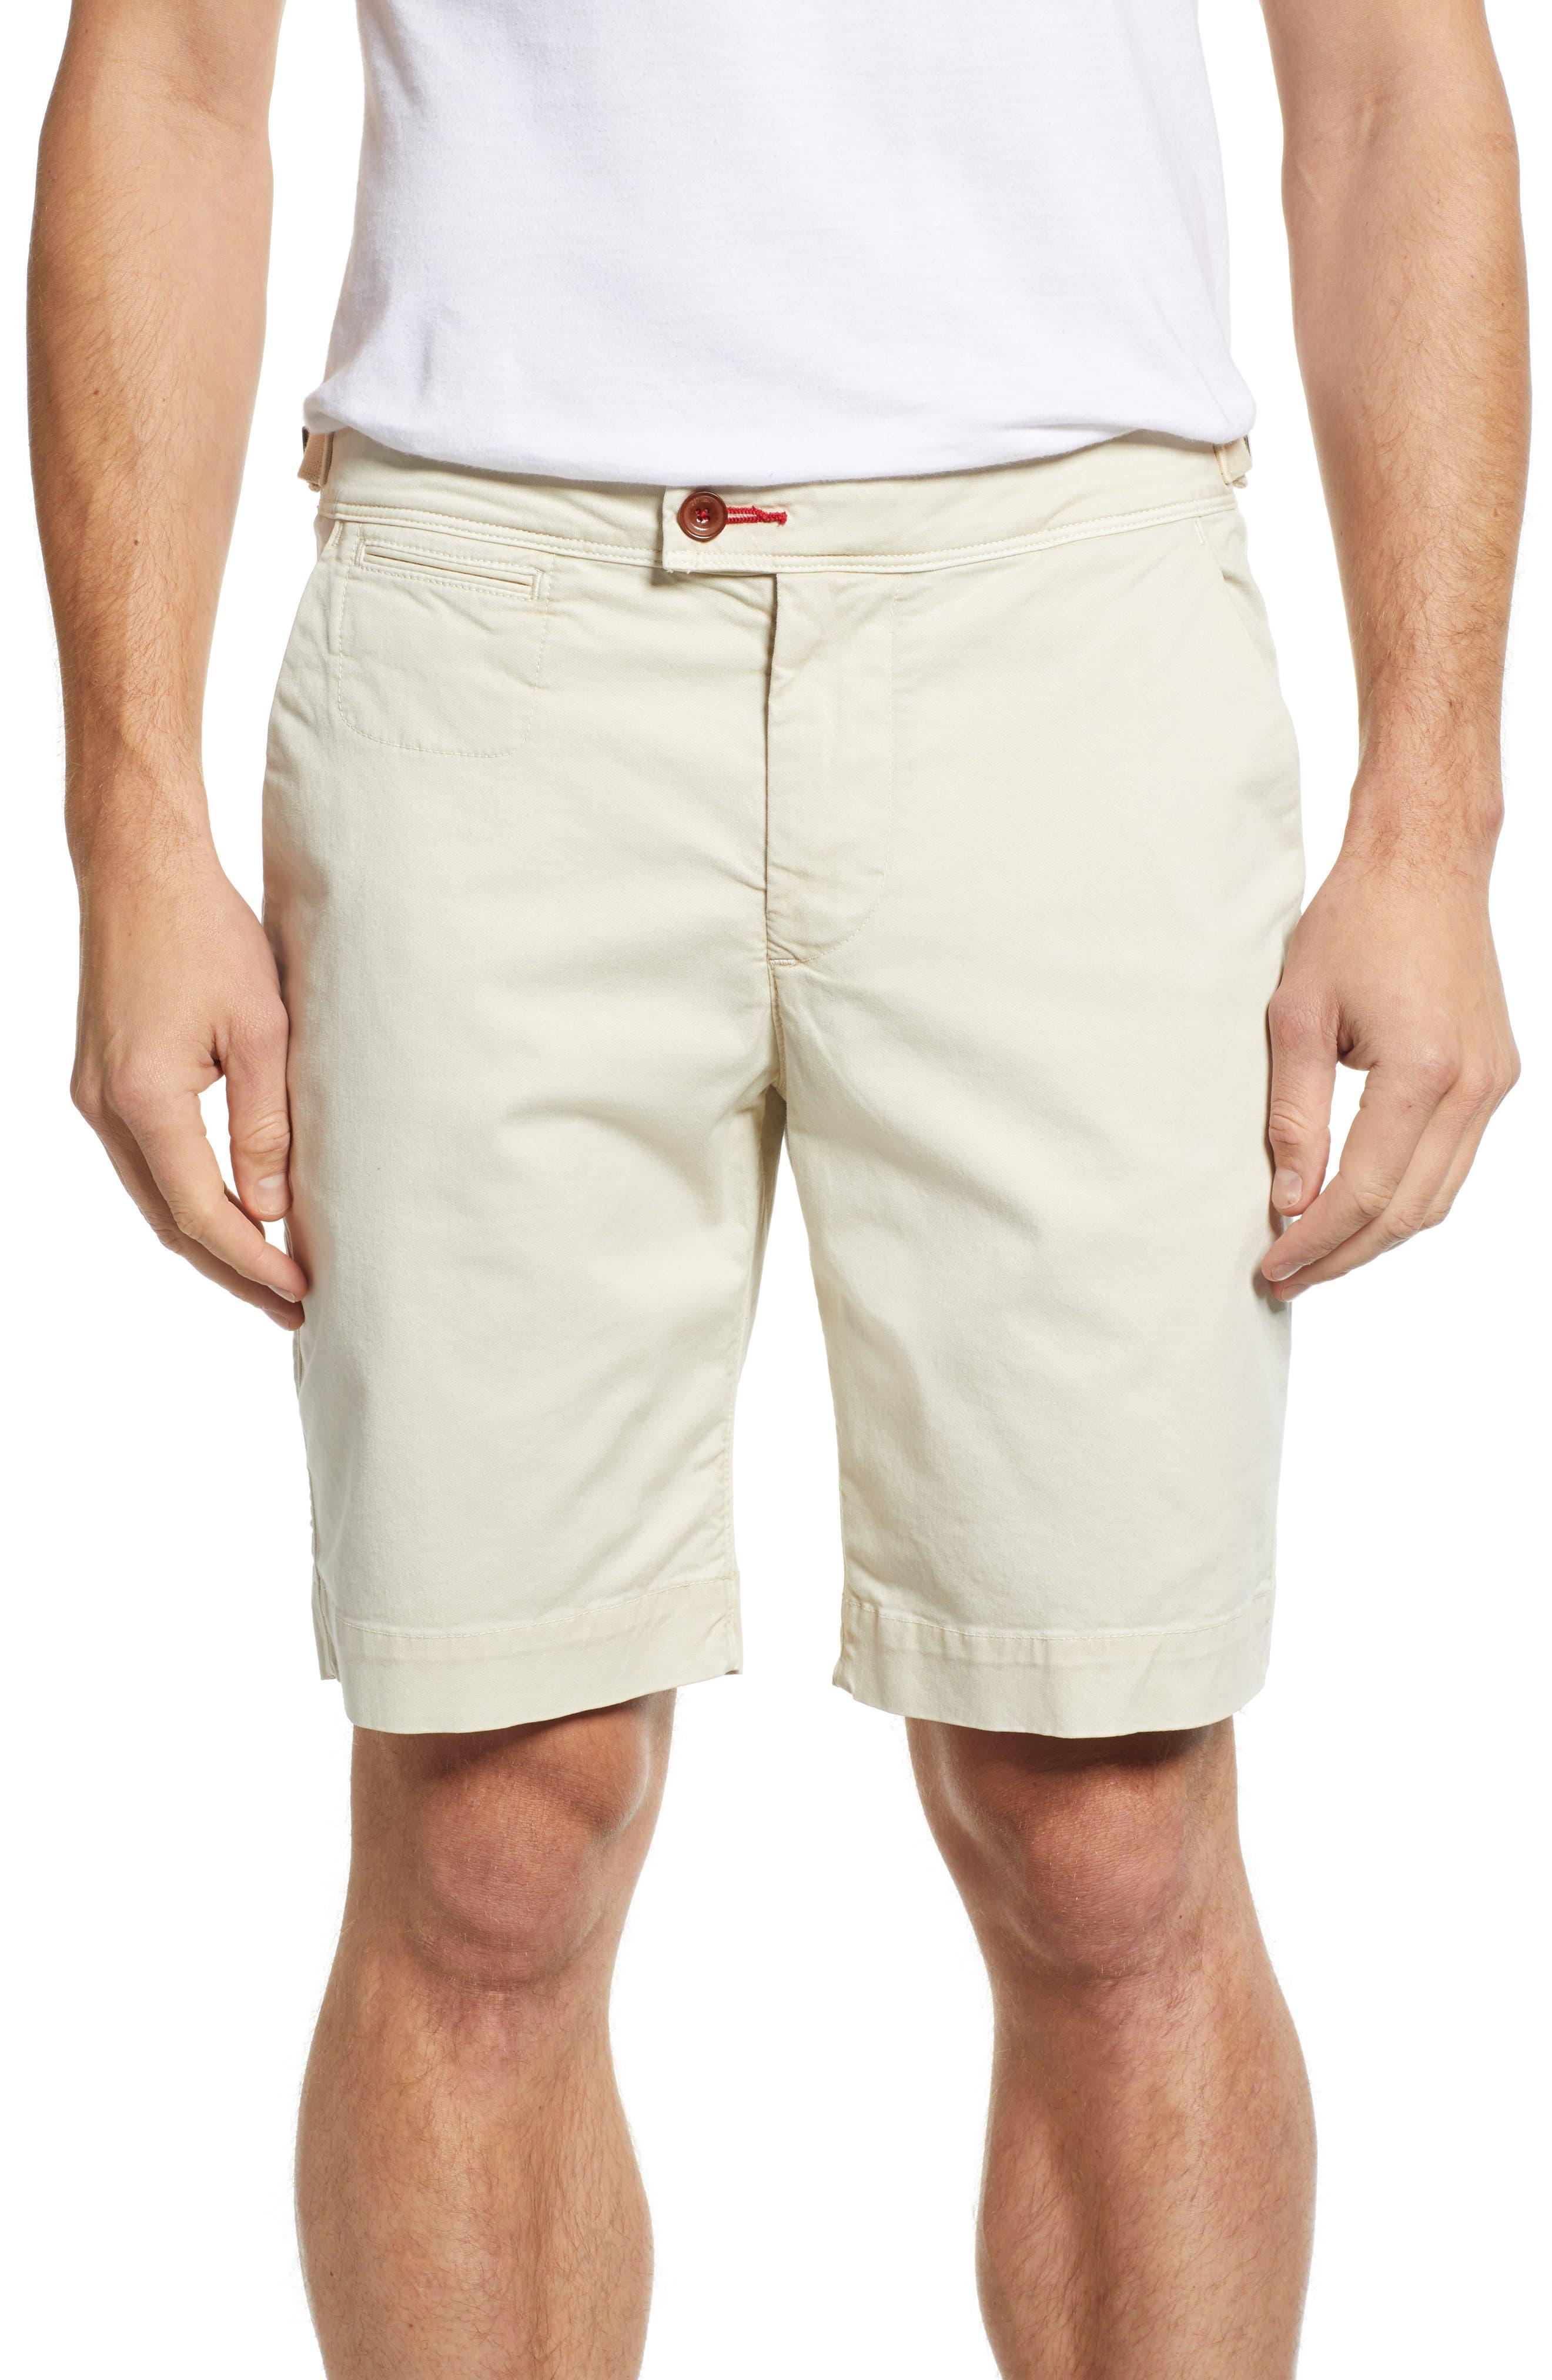 Triumph Shorts,                             Main thumbnail 1, color,                             130